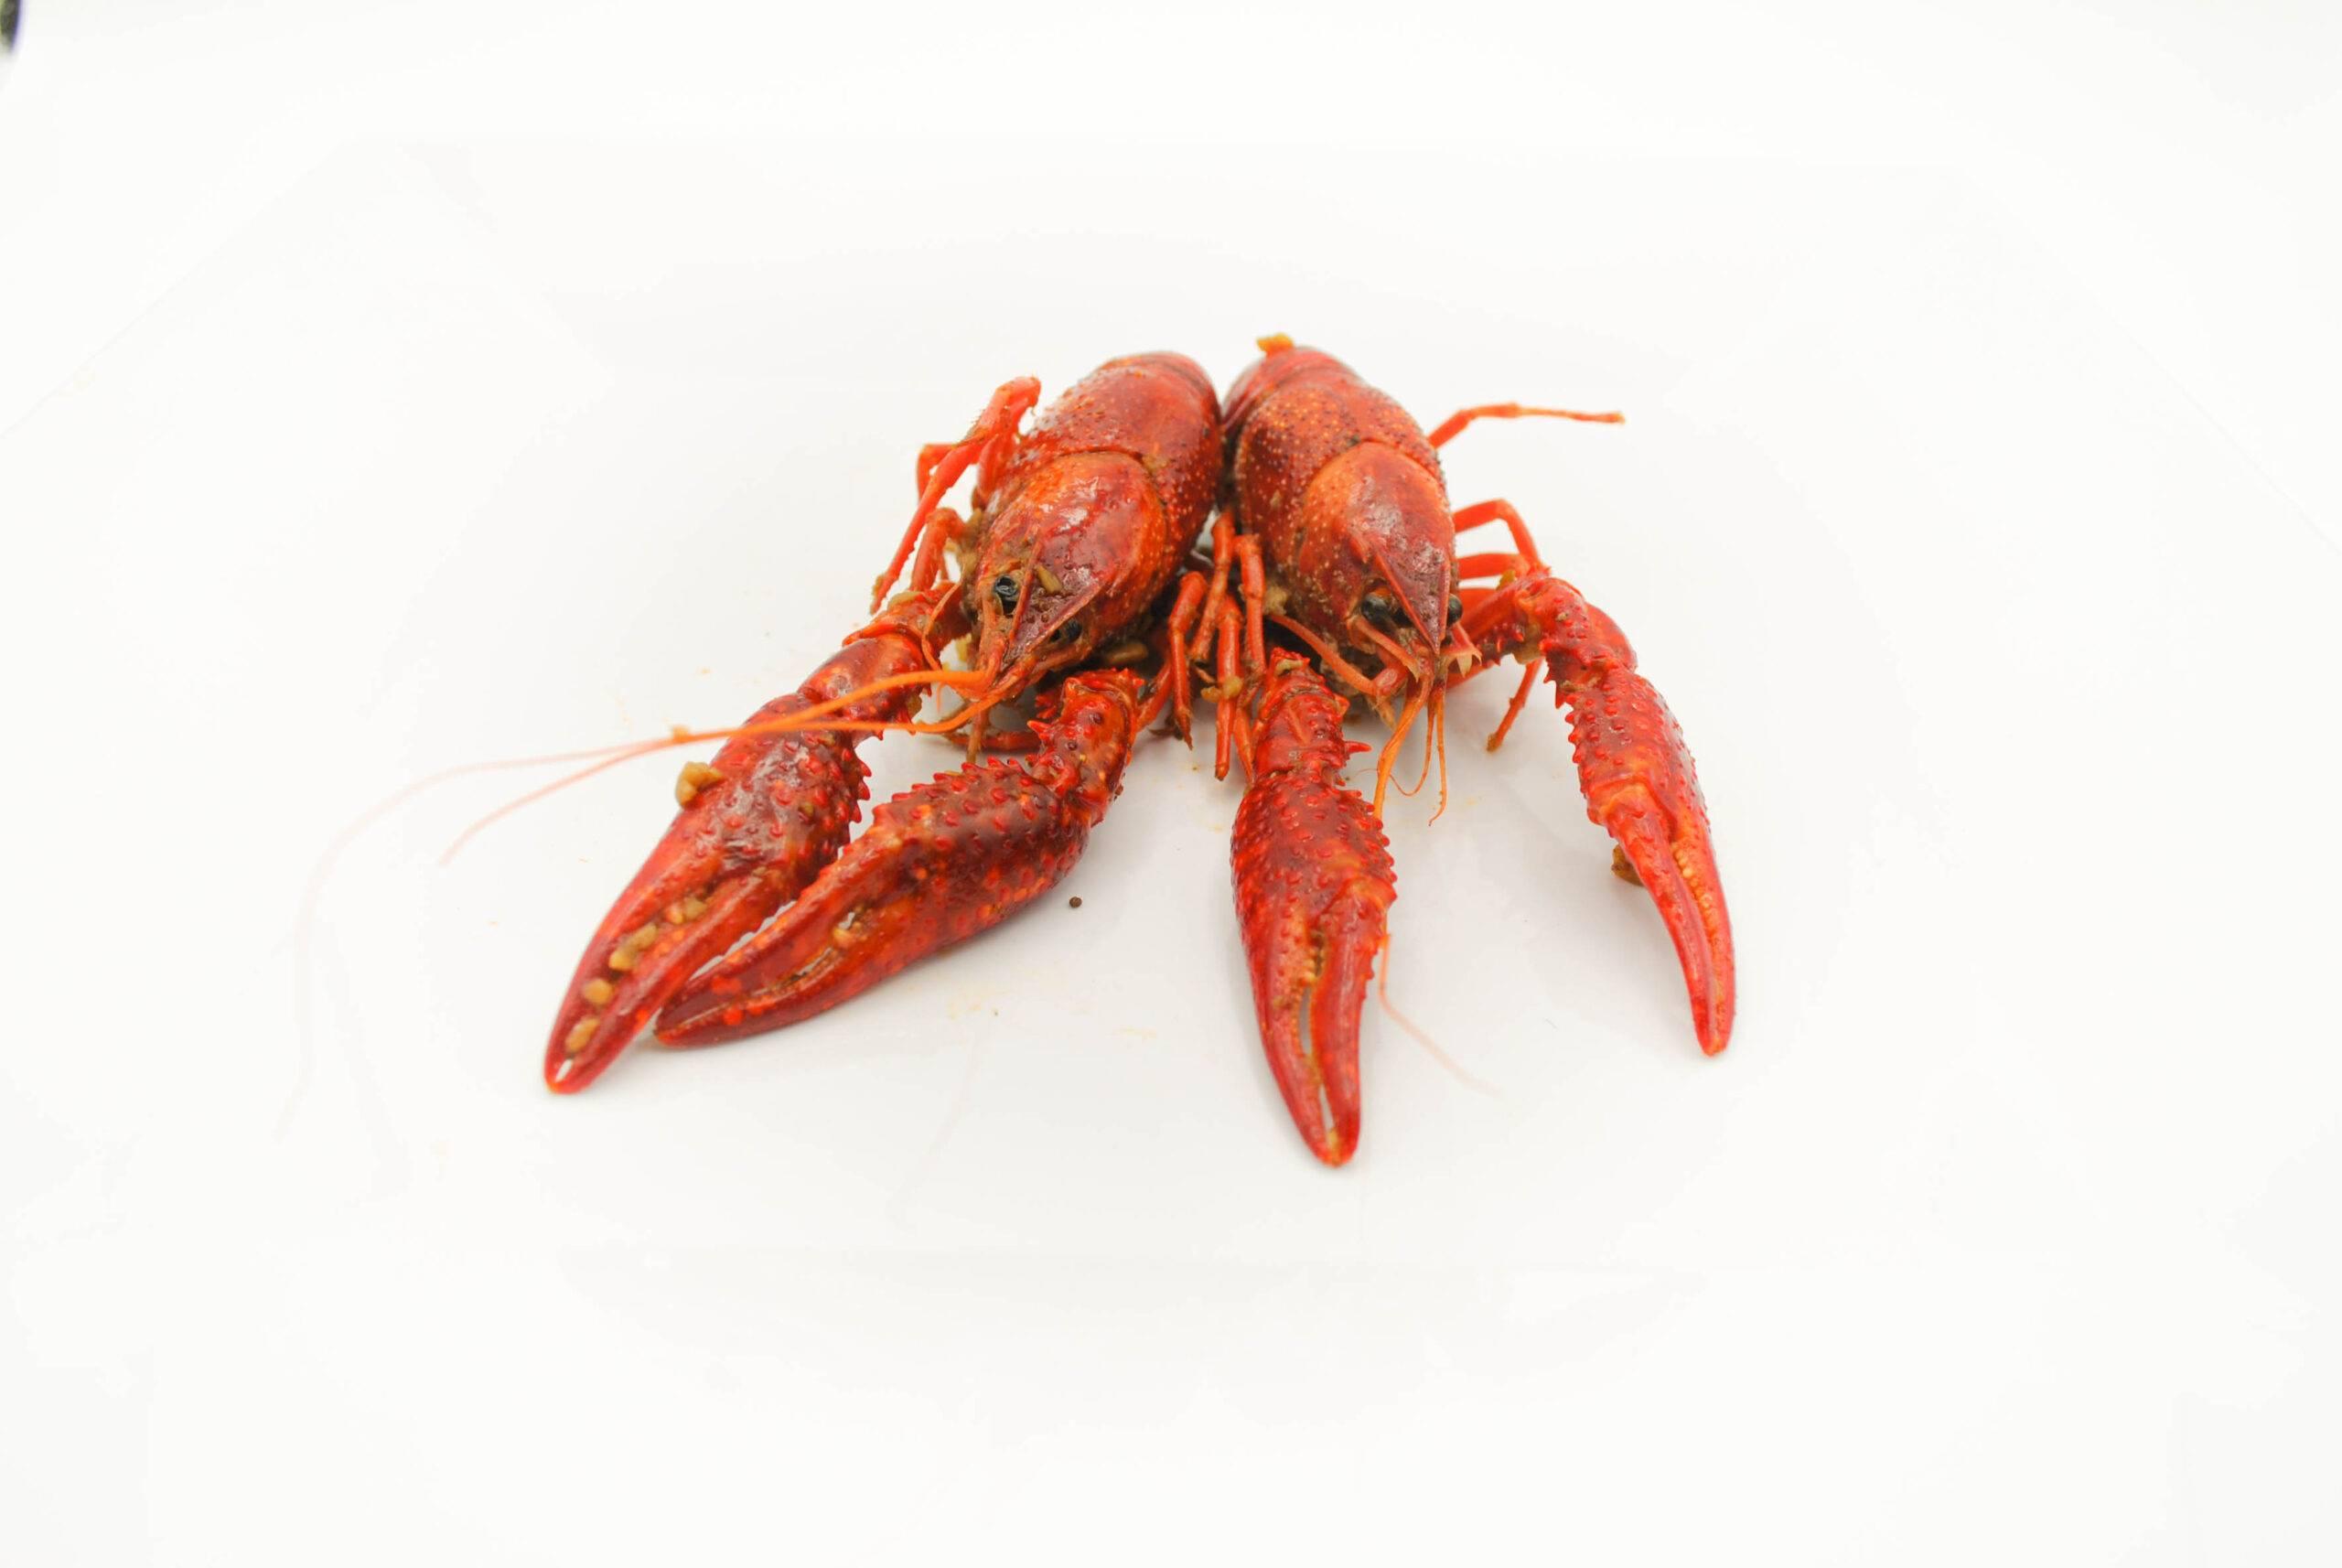 Cray for Crawfish!